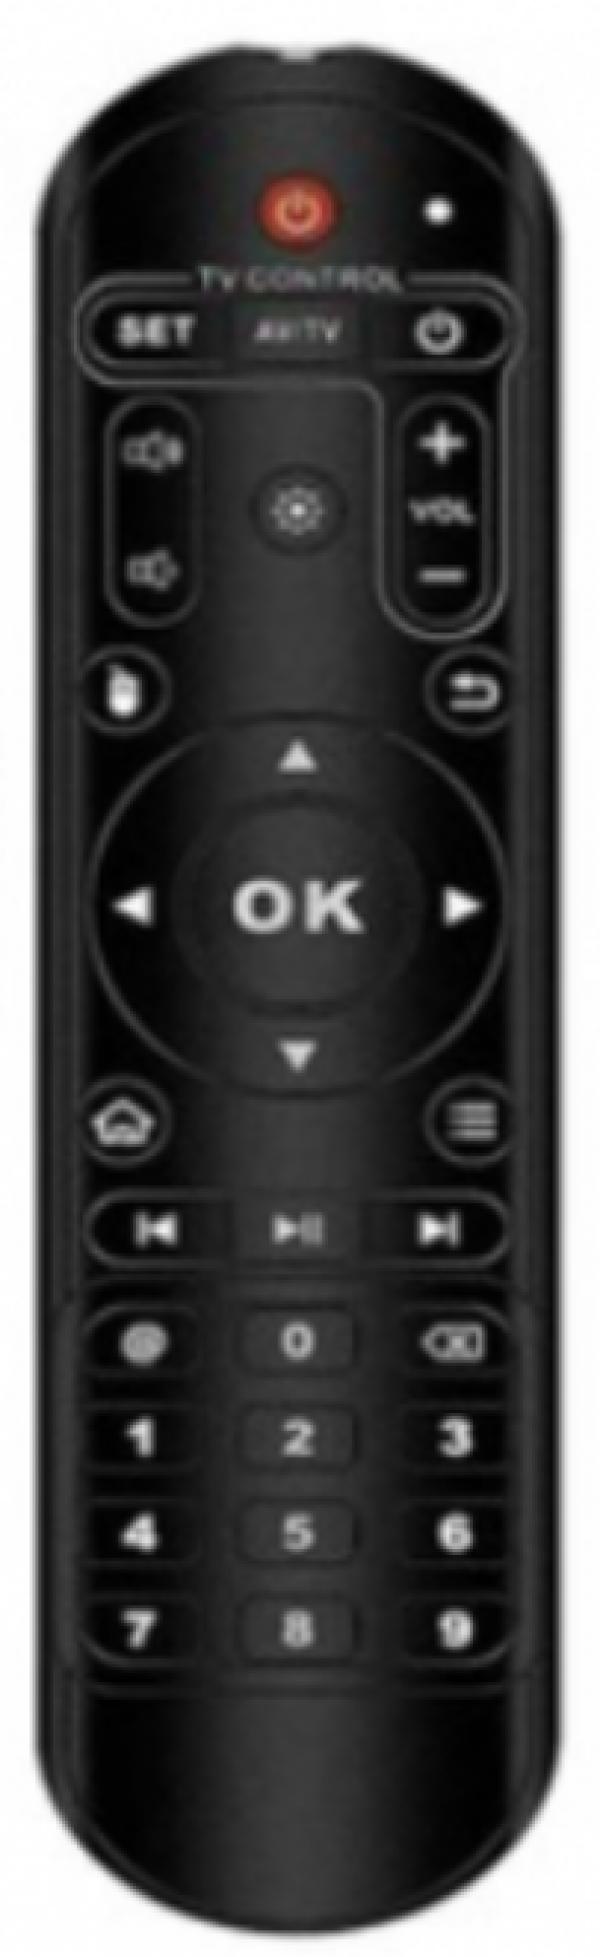 GMB-X96 DALJINSKI za X96 AIR i X96 MAX+  Android TV Box, remote controller